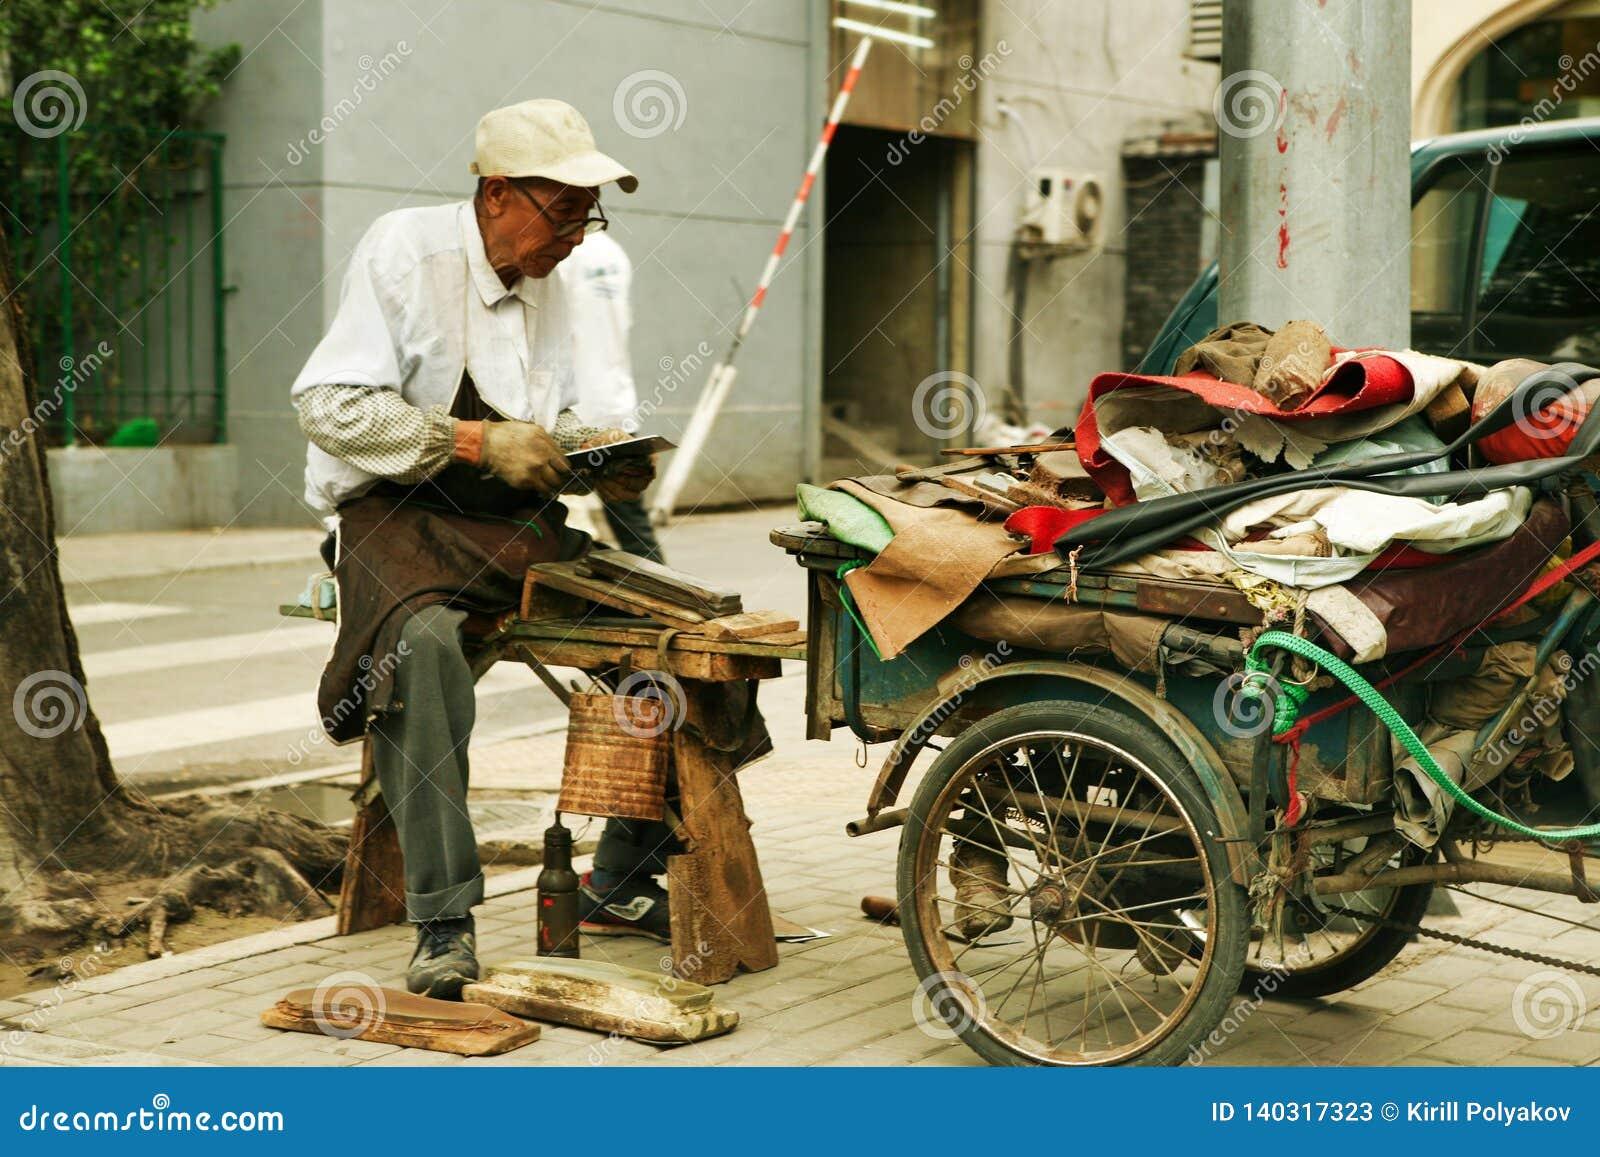 Beijing, China - June 10, 2018: Chinese elderly man repairs shoes on the street of Beijing.